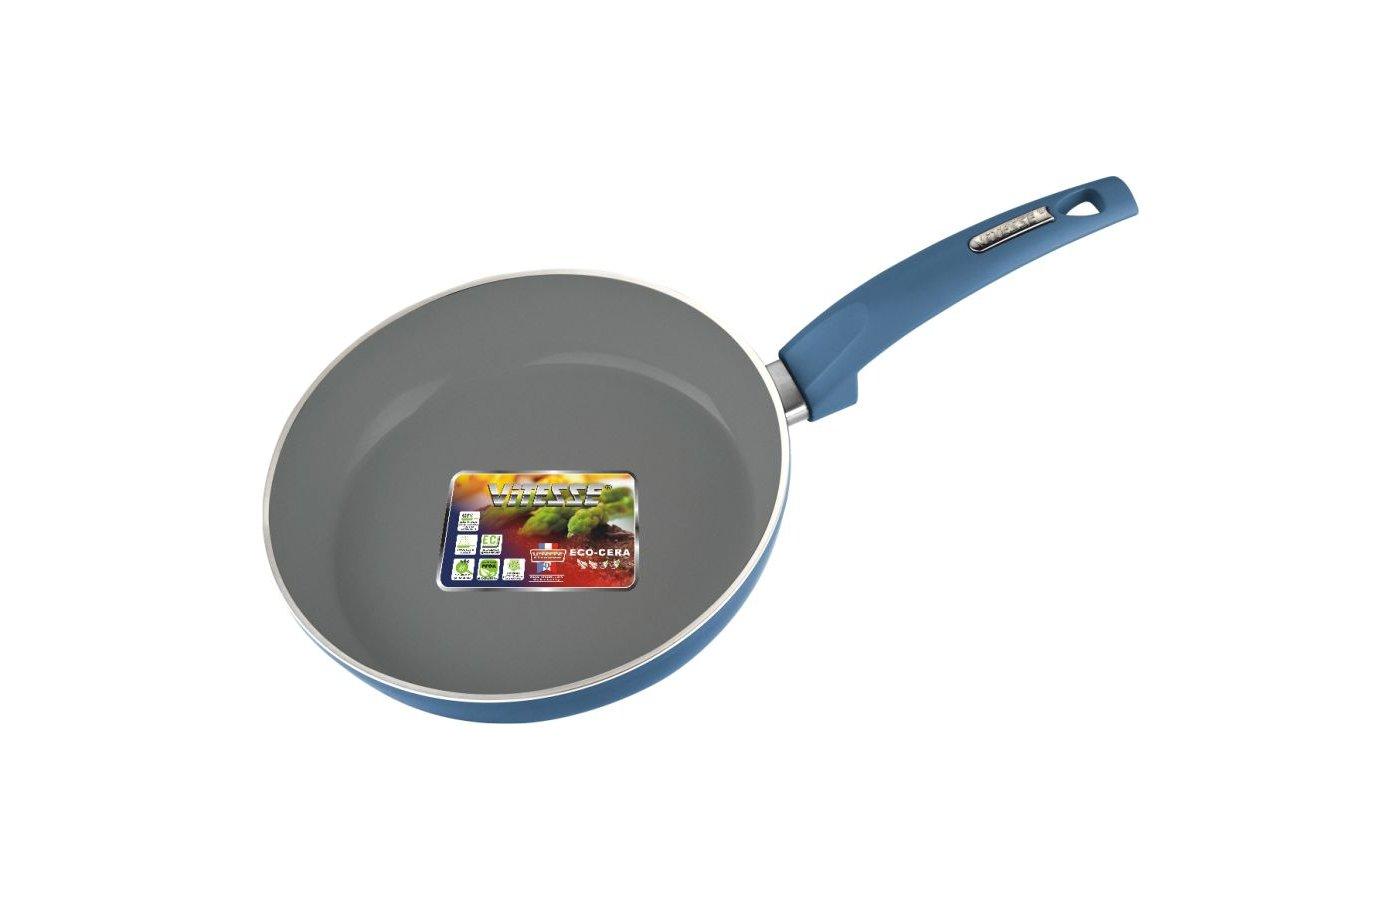 Сковорода VITESSE VS-2507 Сков 24см ков ал 3мм кер